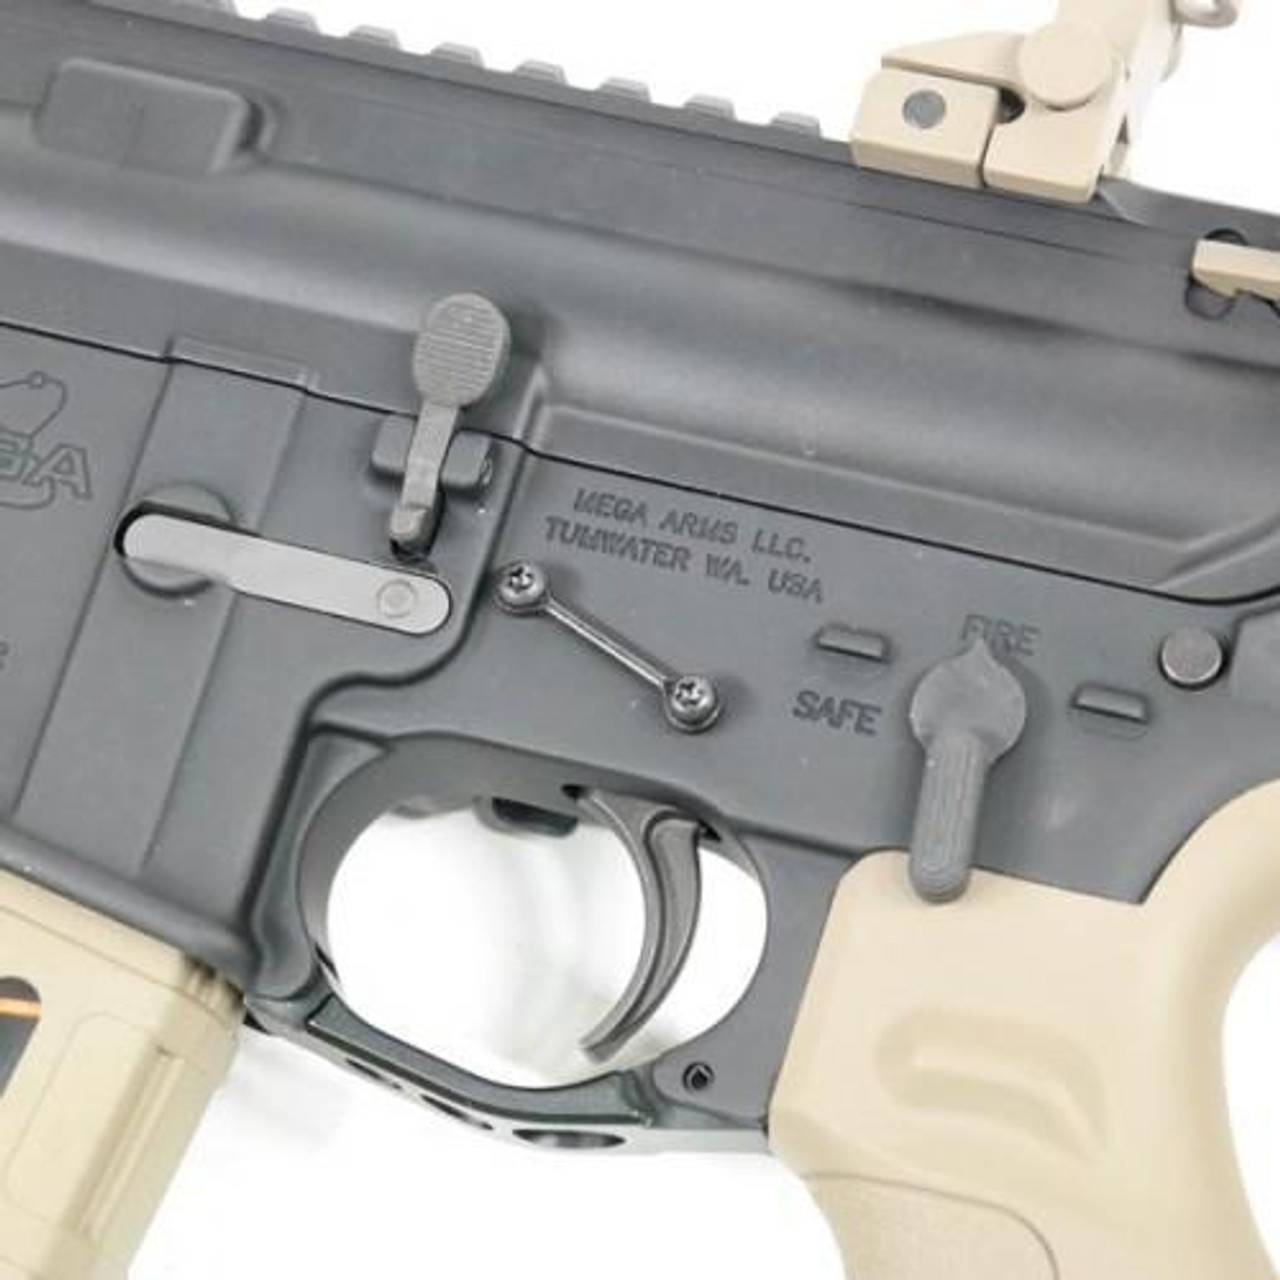 AR-15 Anti Walk/Rotation Trigger/Hammer Pin kit (LP-1018722)